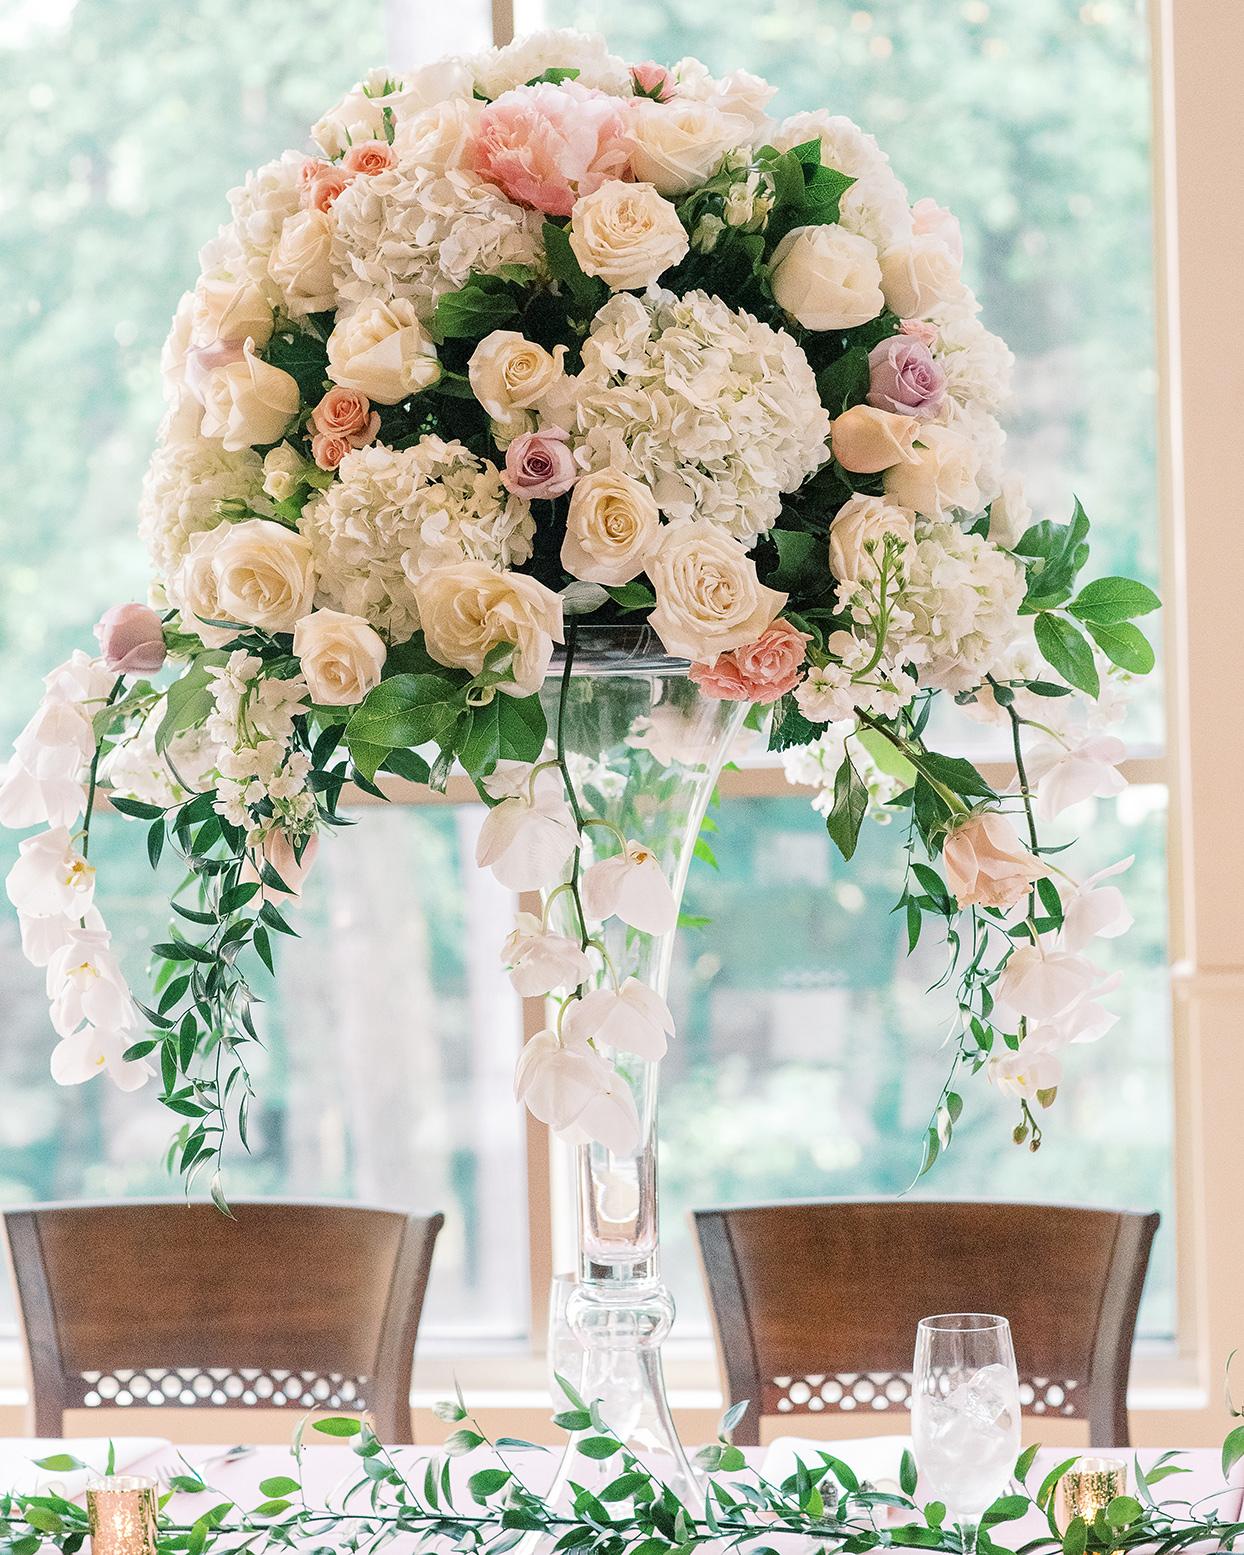 amelia justin wedding reception large floral centerpiece